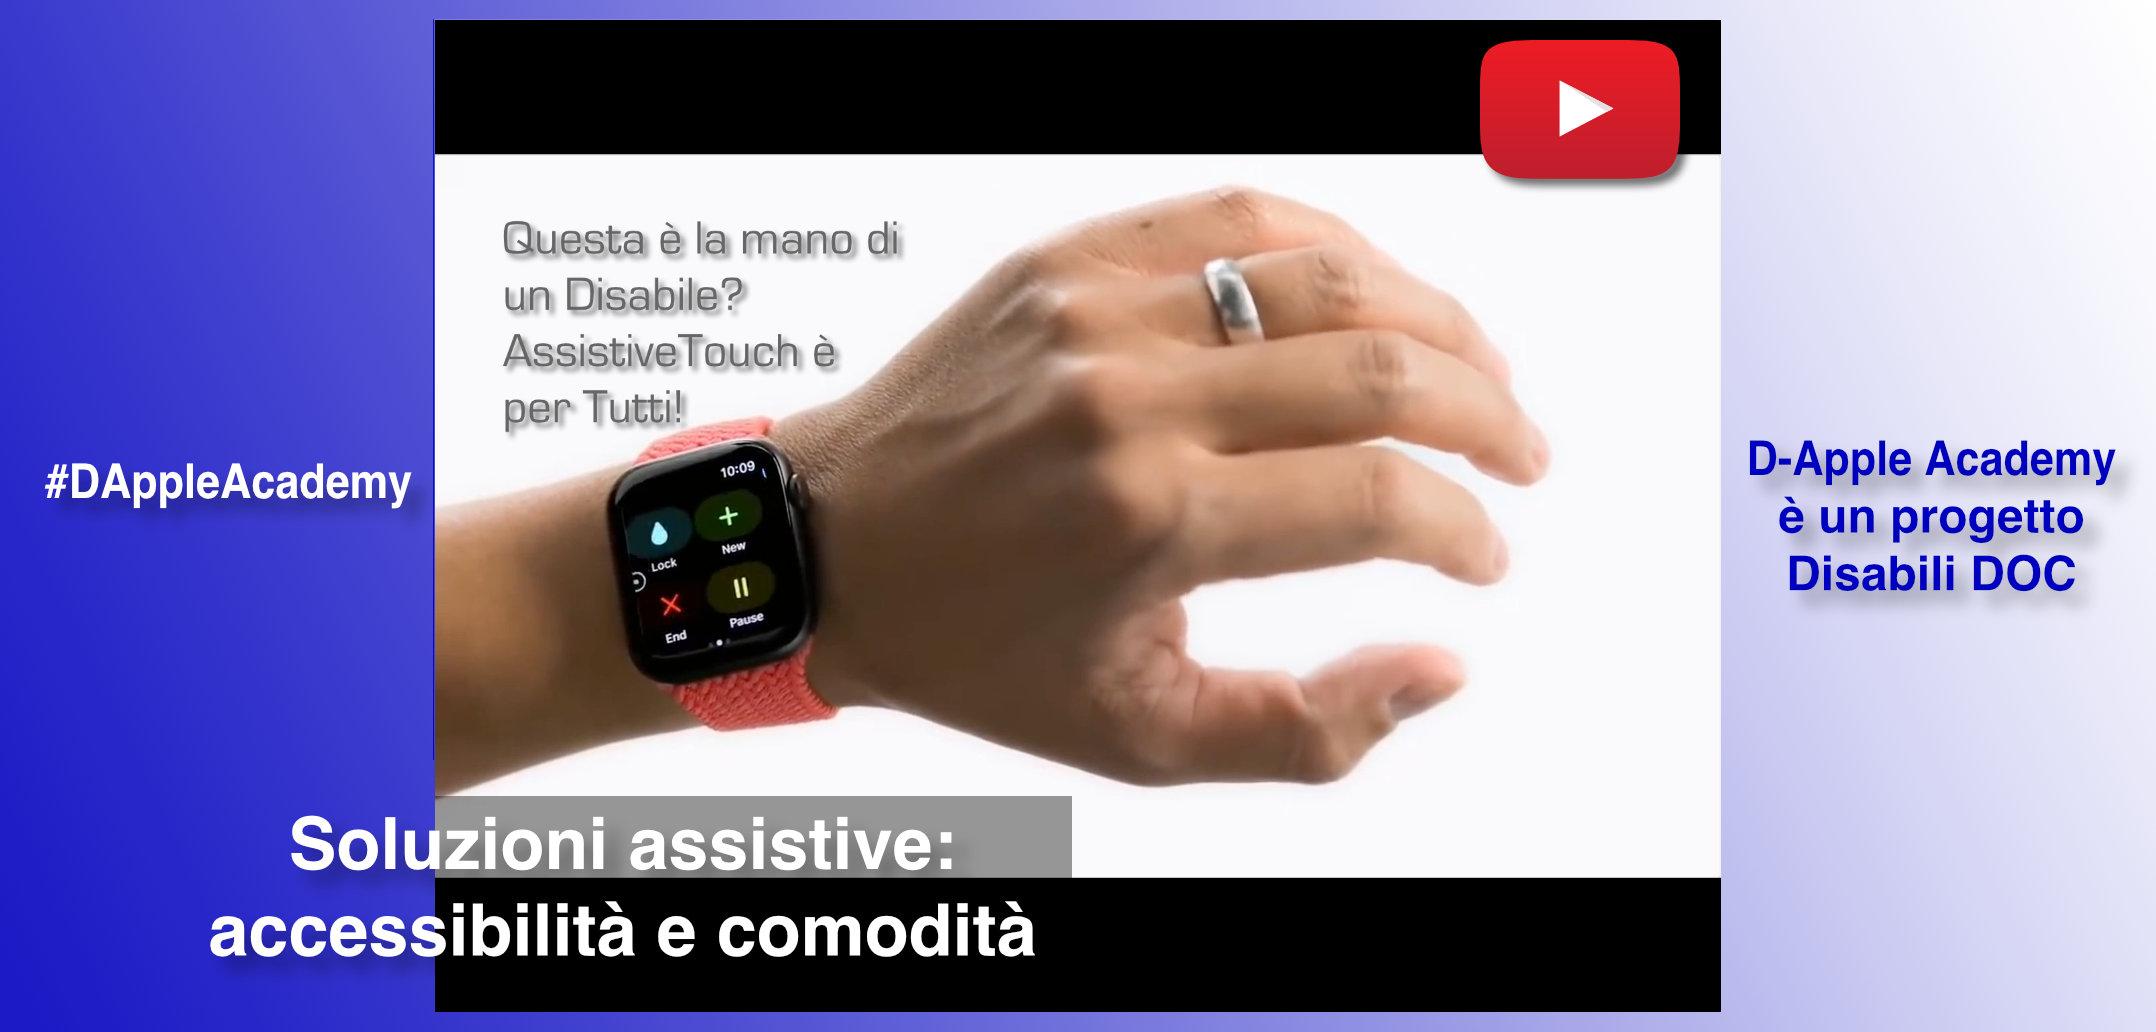 #DAppleAcademy / Parte 6ª / VIDEO / Apple: nuove funzioni per l'Accessibilità, il Re è AssistiveTouch per Apple Watch